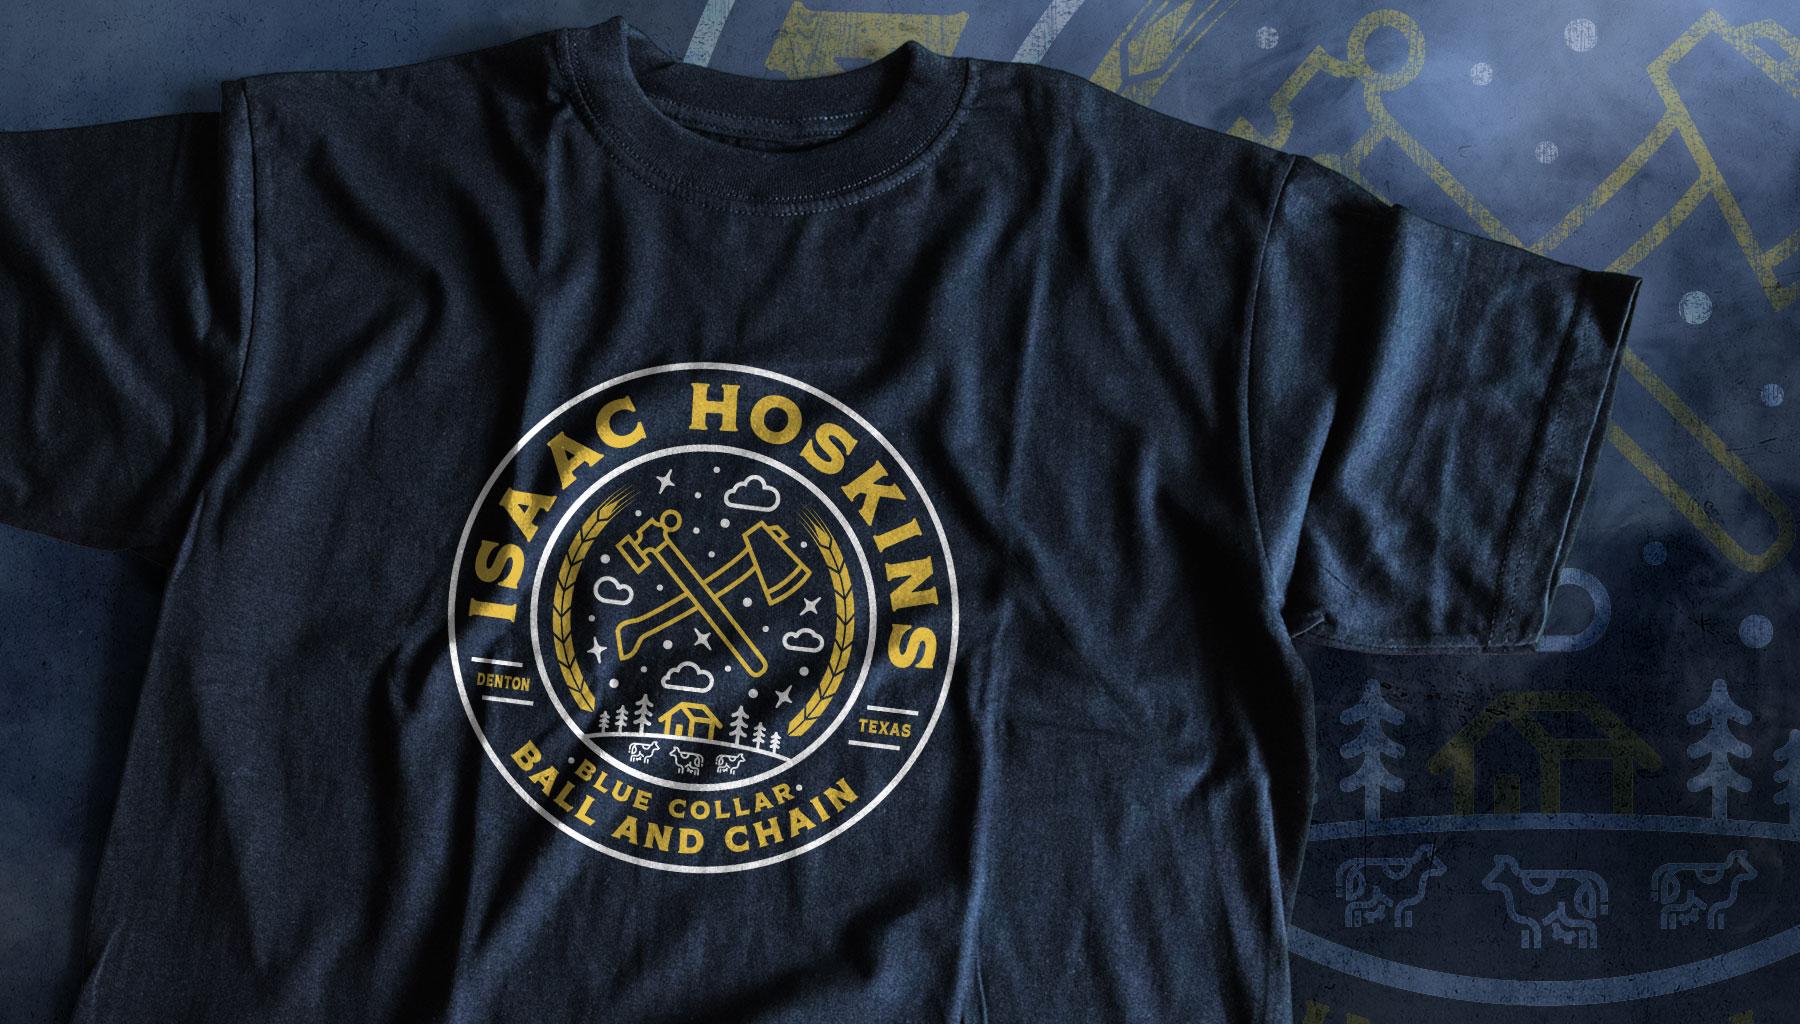 Isaac Hoskins Shirt Ball and Chain